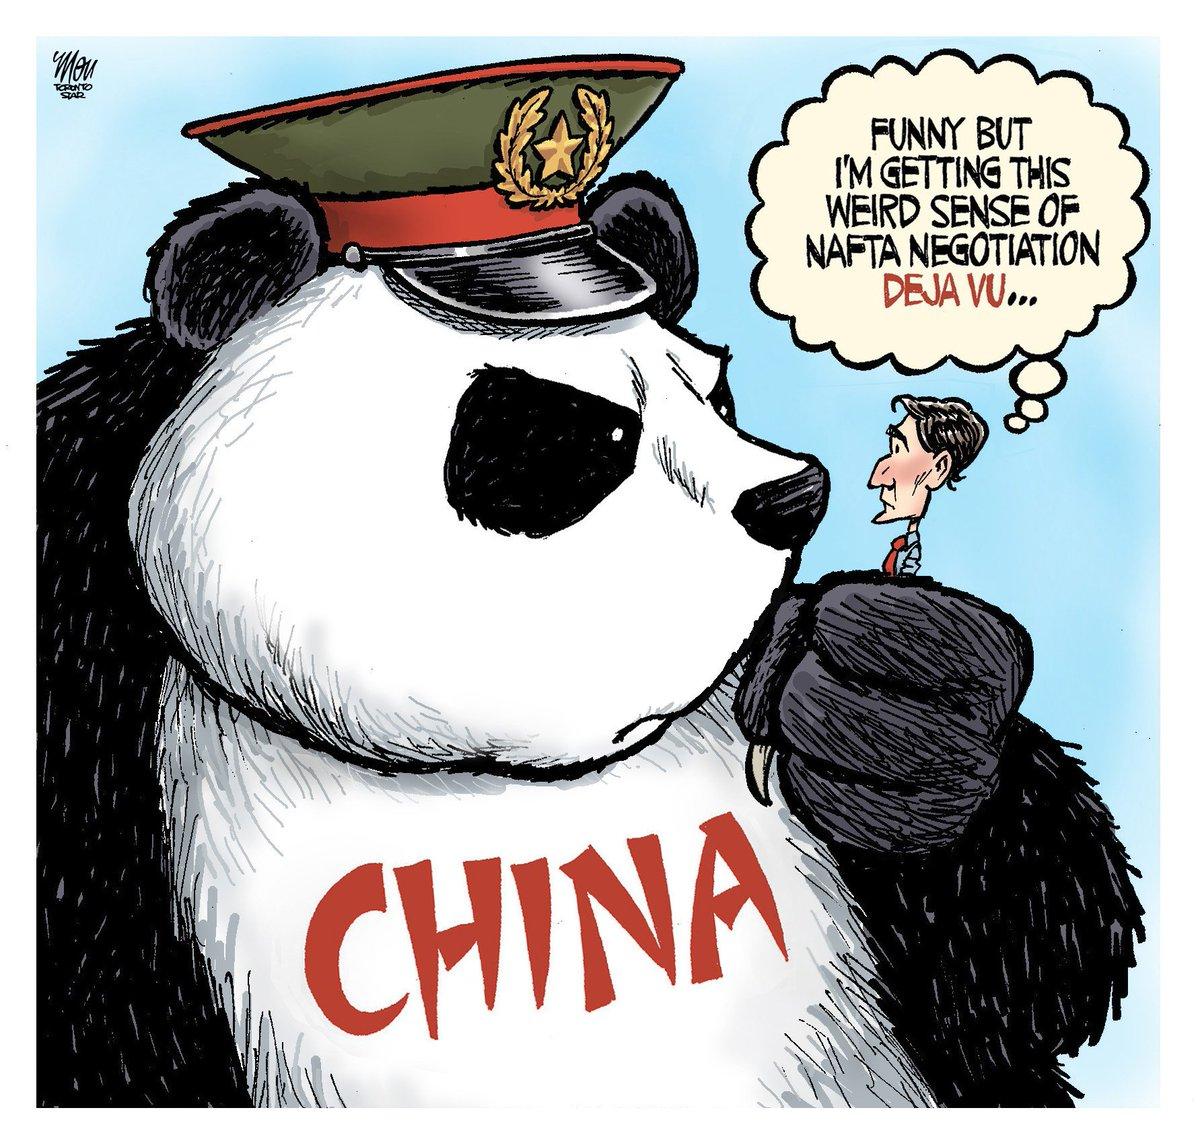 Here's today's #China cartoon in @TorontoStar #cdnpoli